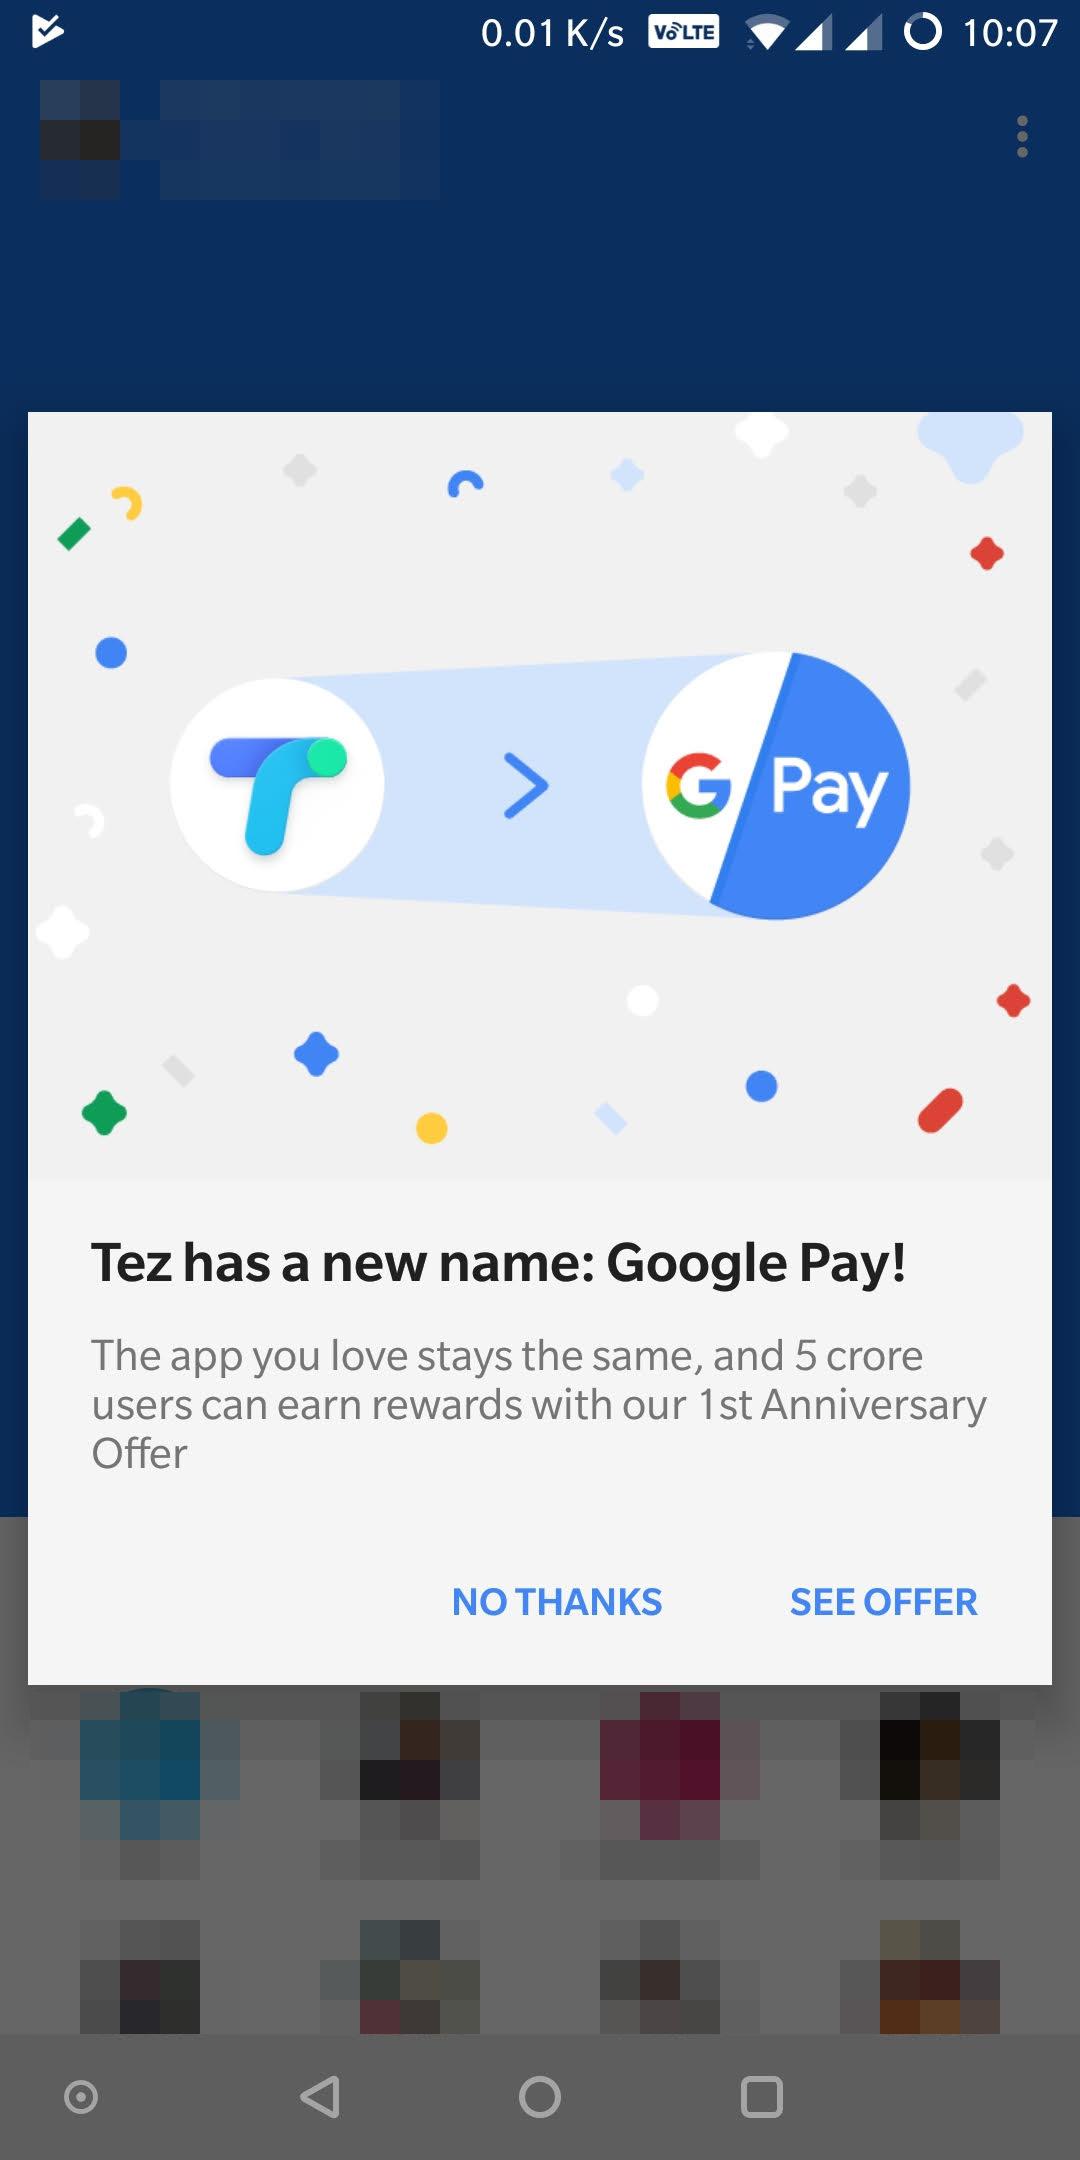 Update: APK Download] Tez, Google's mobile payment platform in India